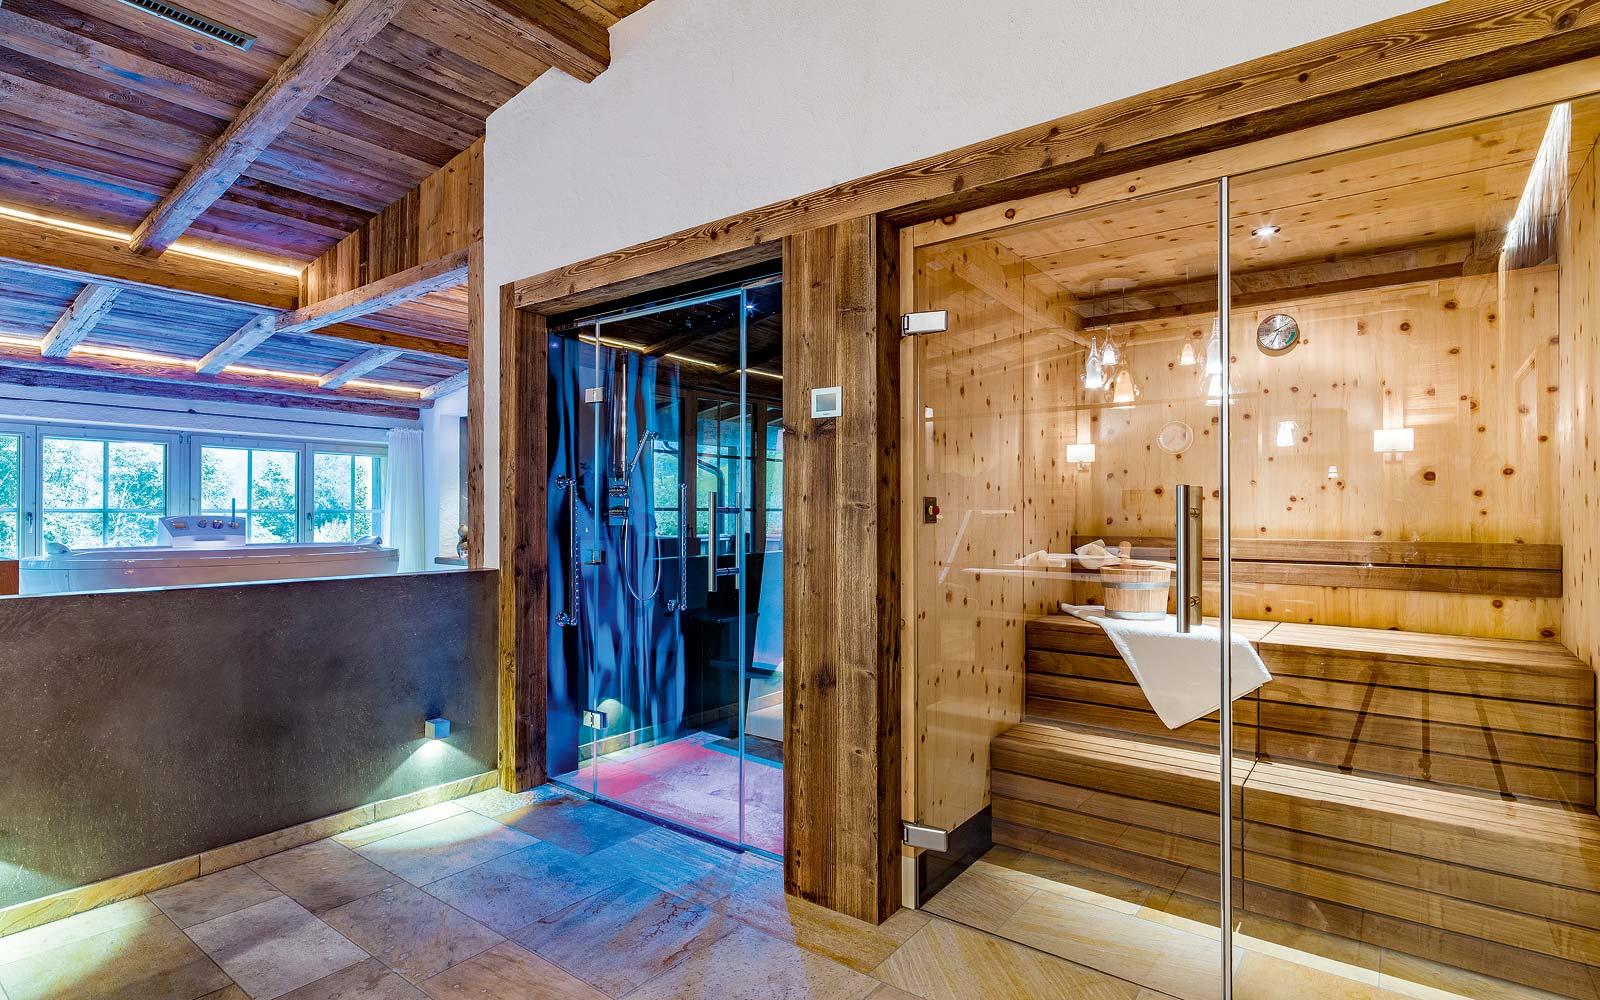 5 star SPA Hotel Jagdhof Tyrol Austria